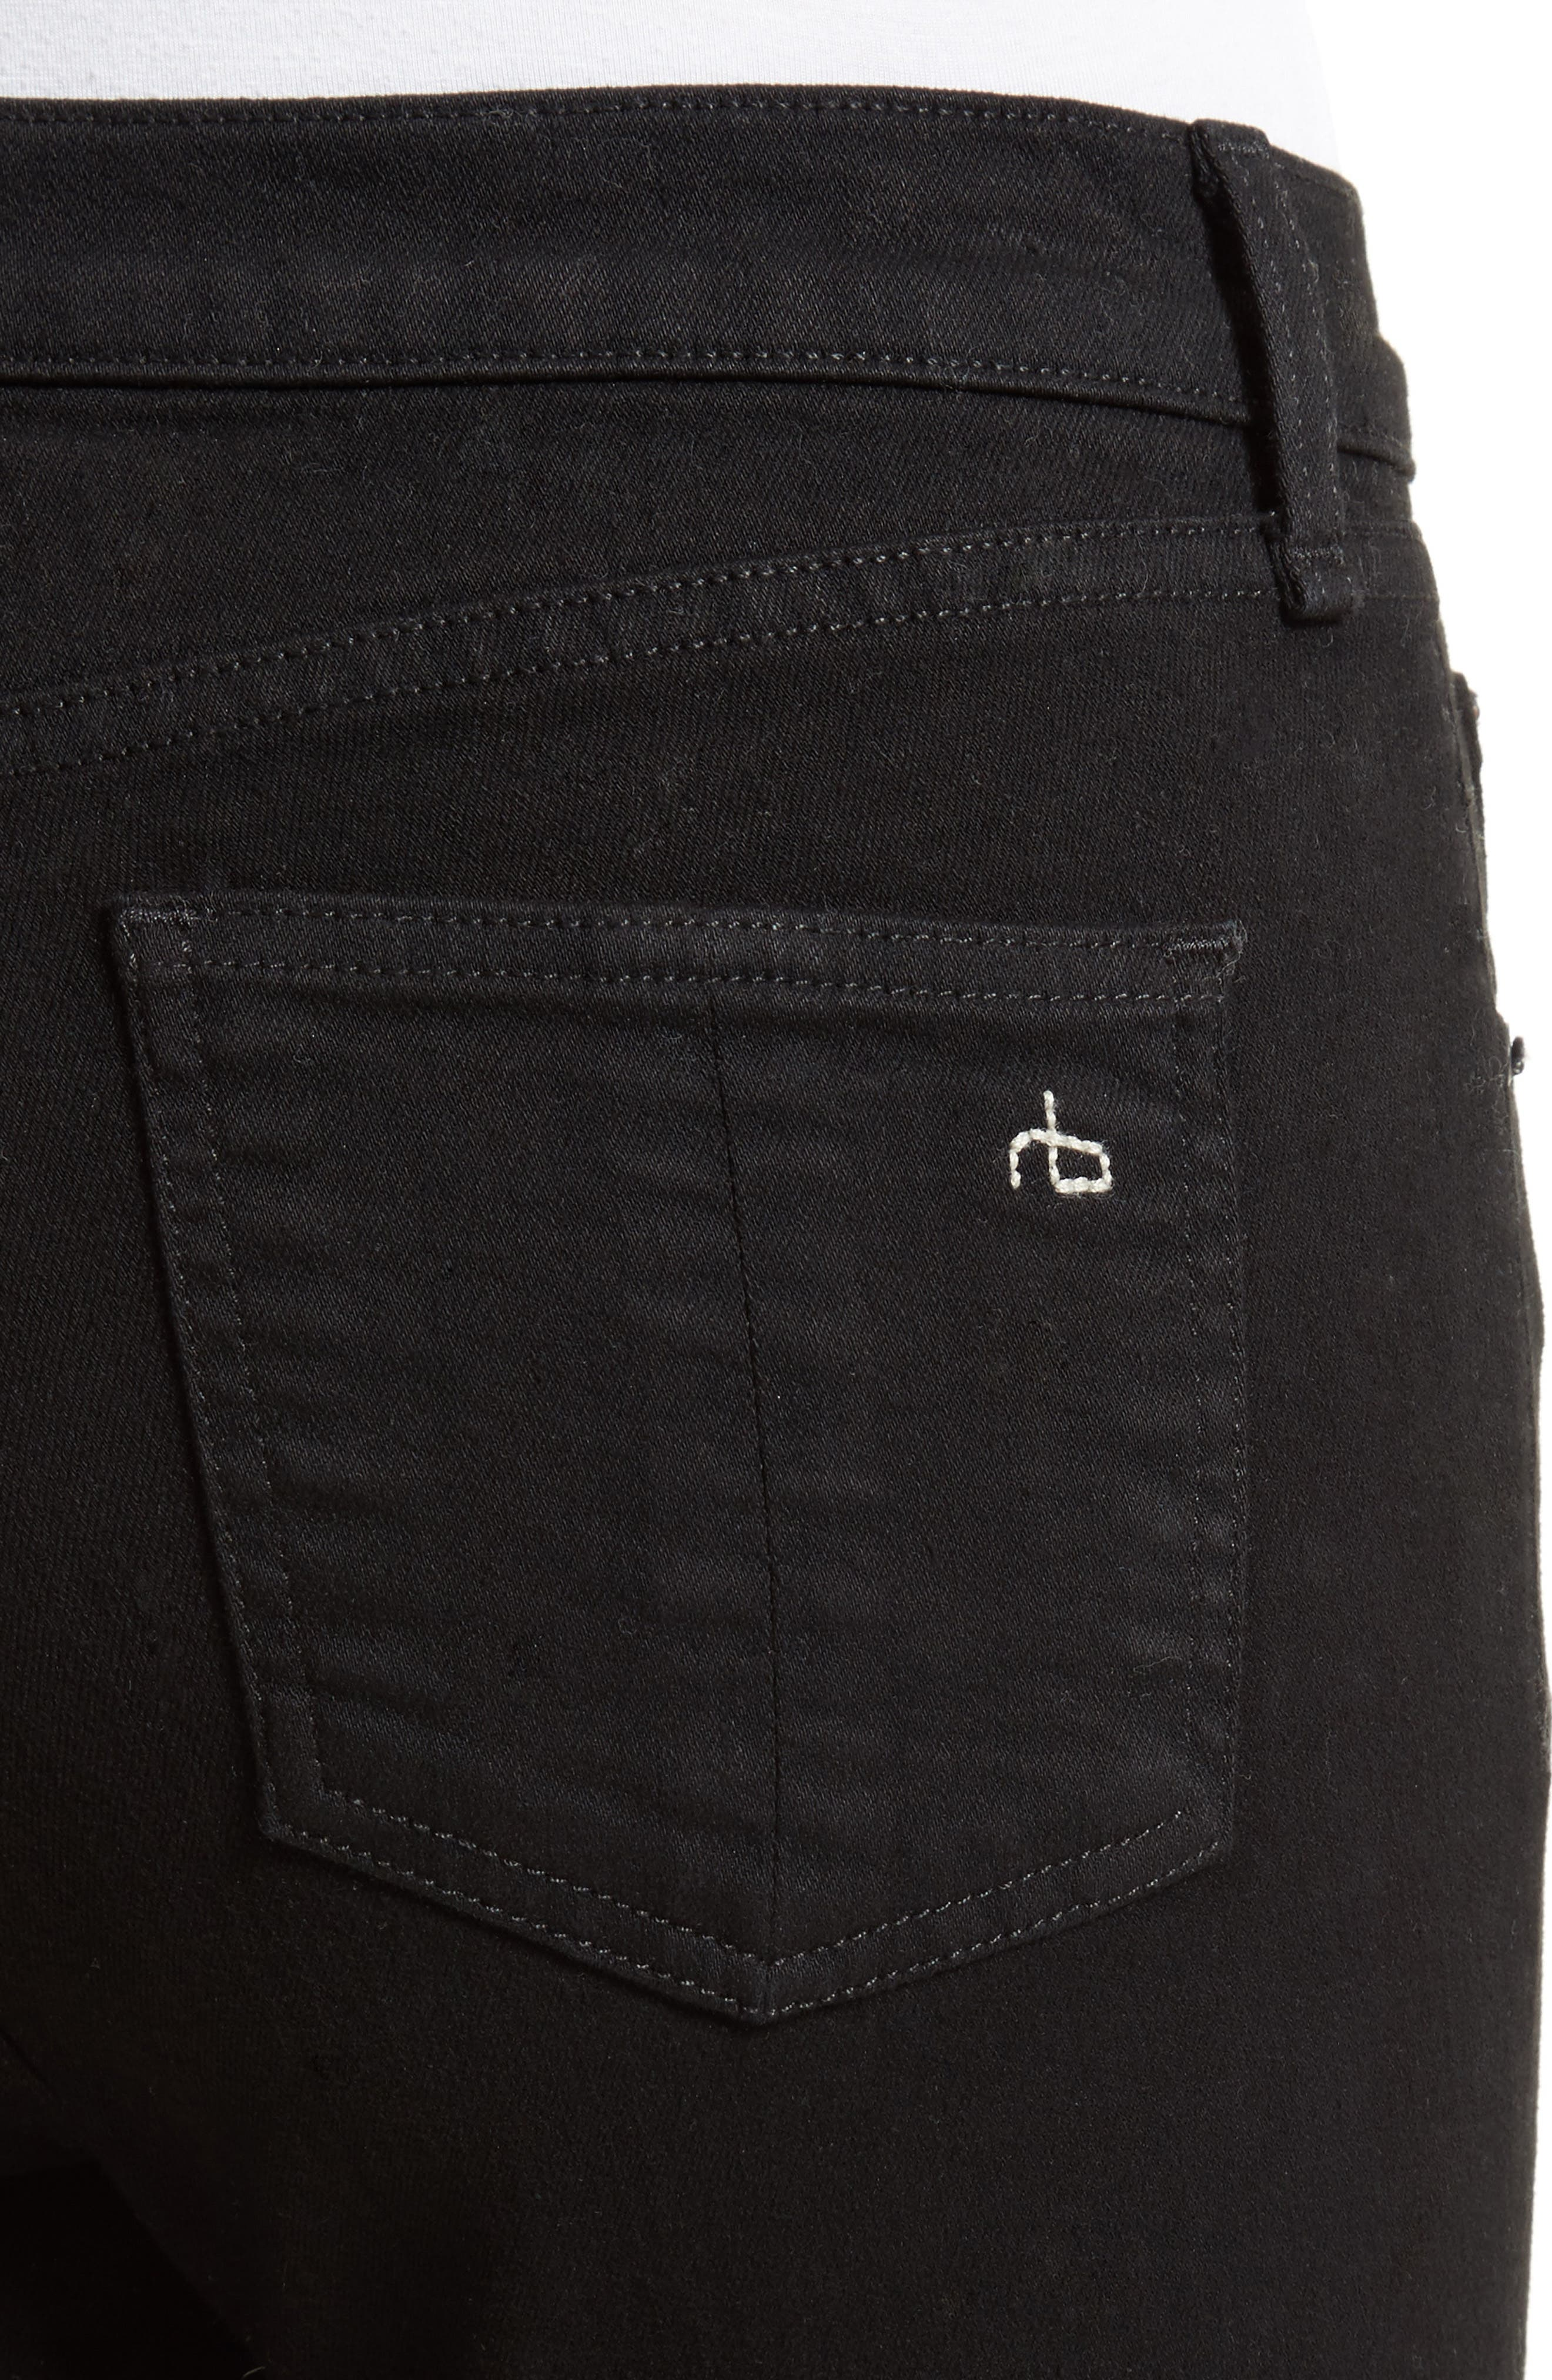 Cutoff Capri Jeans,                             Alternate thumbnail 5, color,                             001